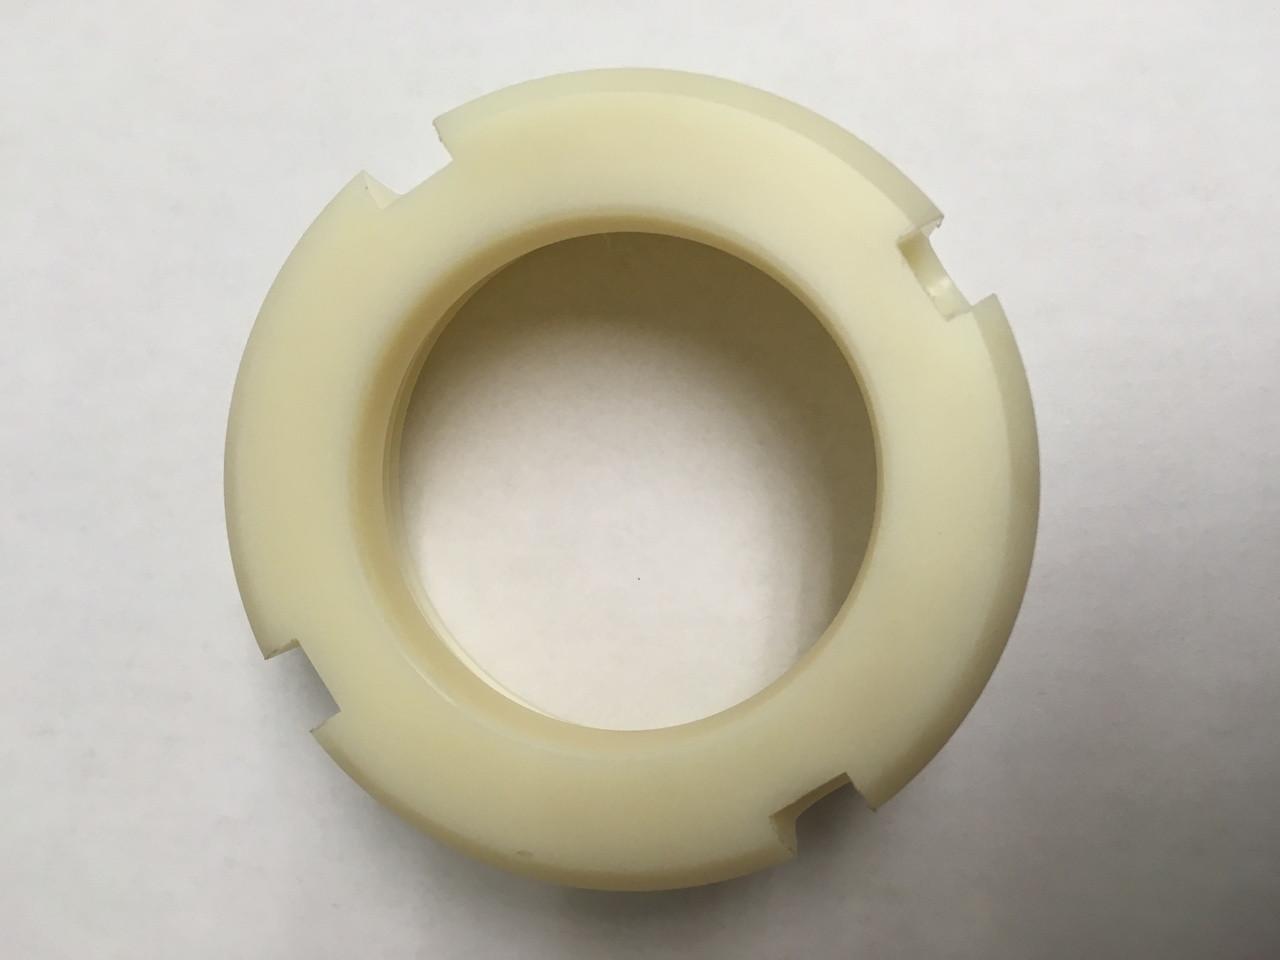 Daniels Food DFS-55 - Nylon Locking Ring - 55065